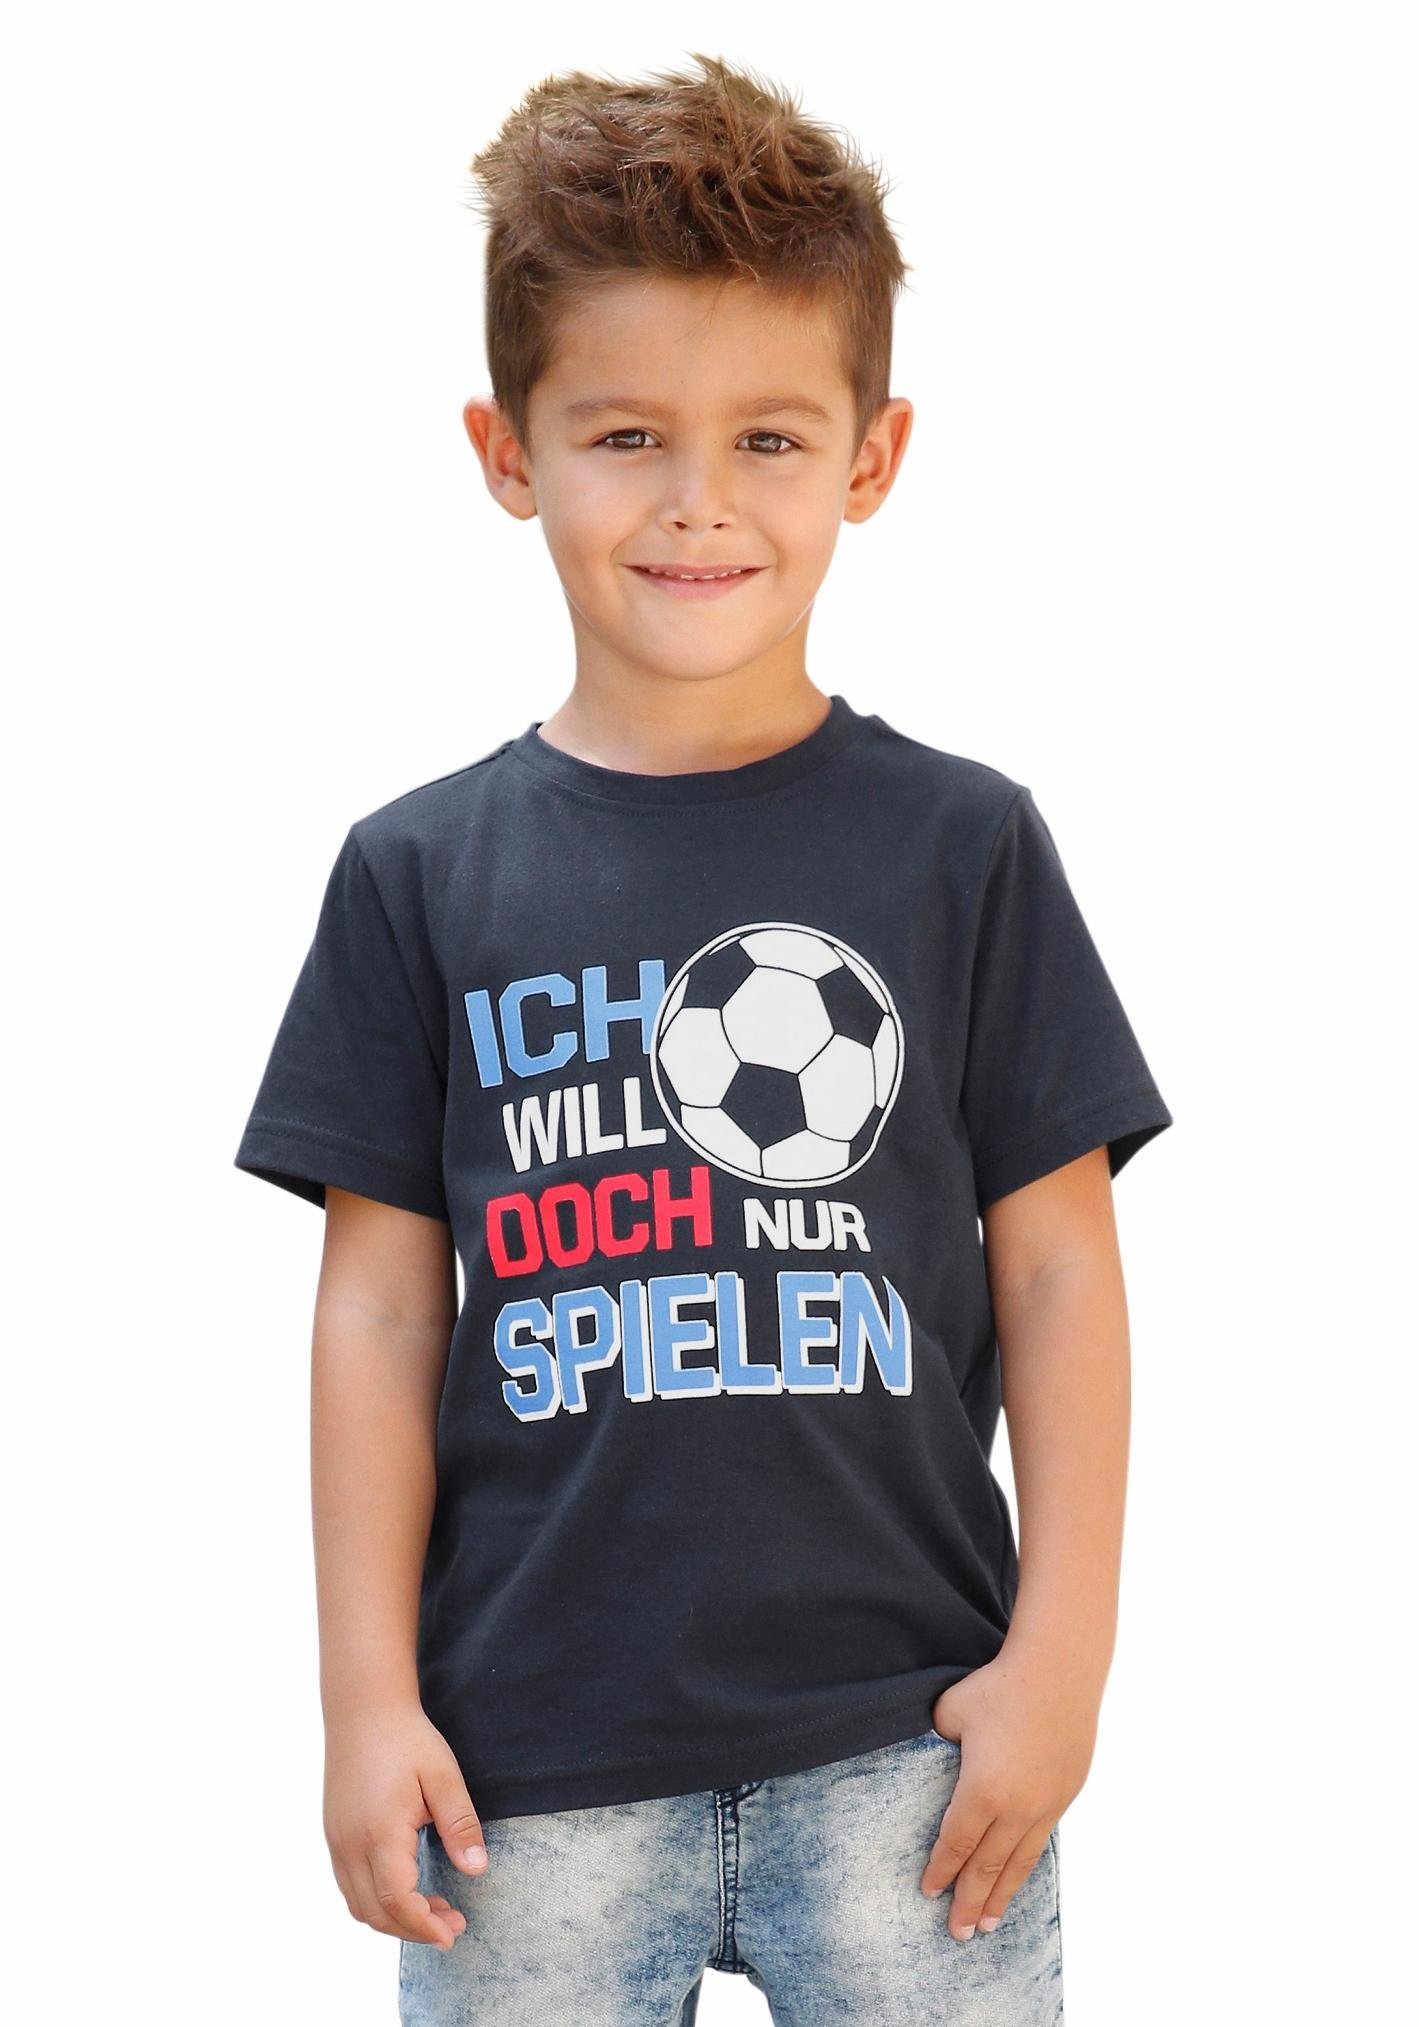 c274c714887d46 KIDSWORLD T-shirt makkelijk gevonden